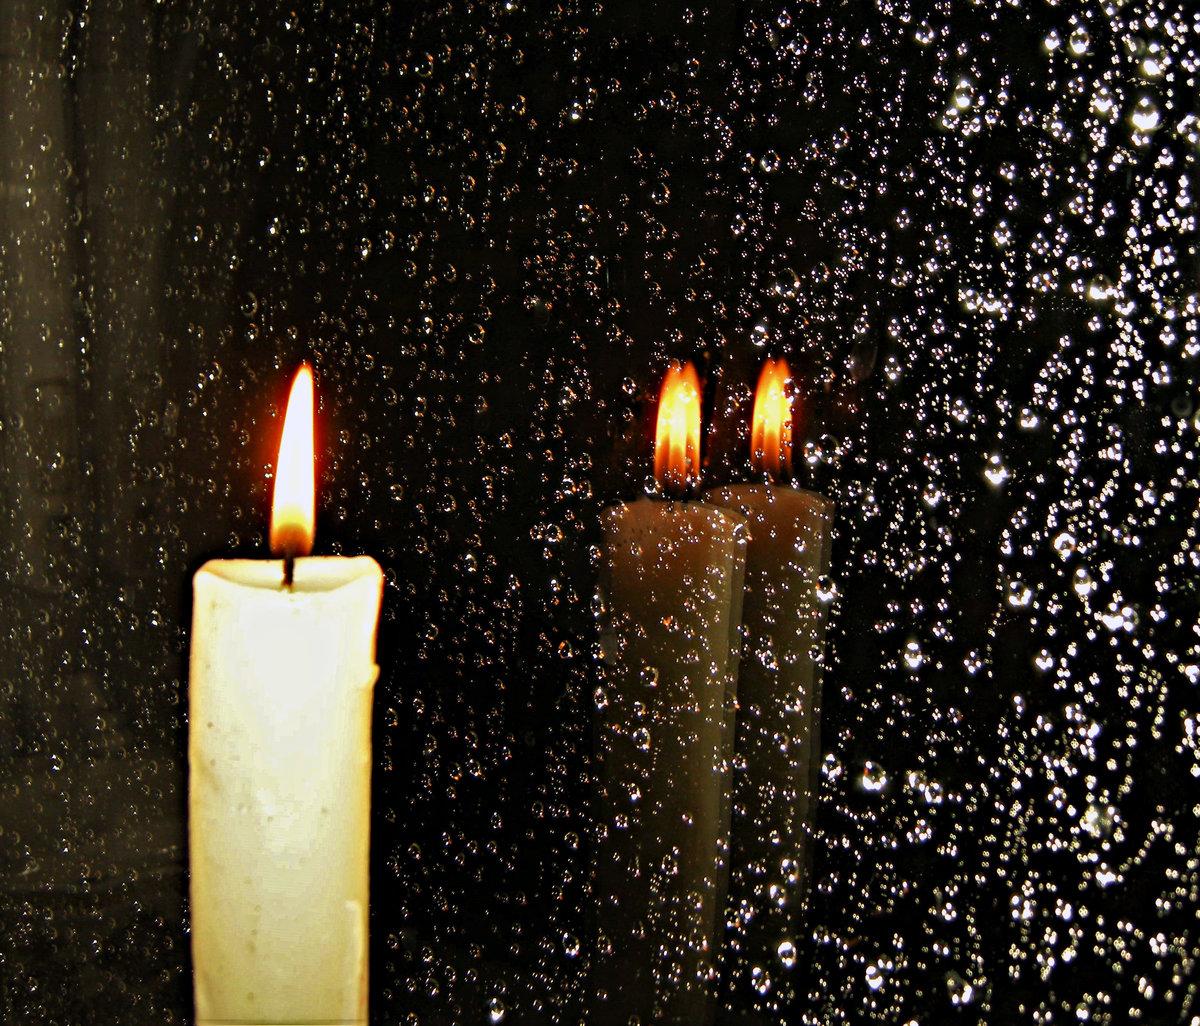 Свеча в ночи картинка